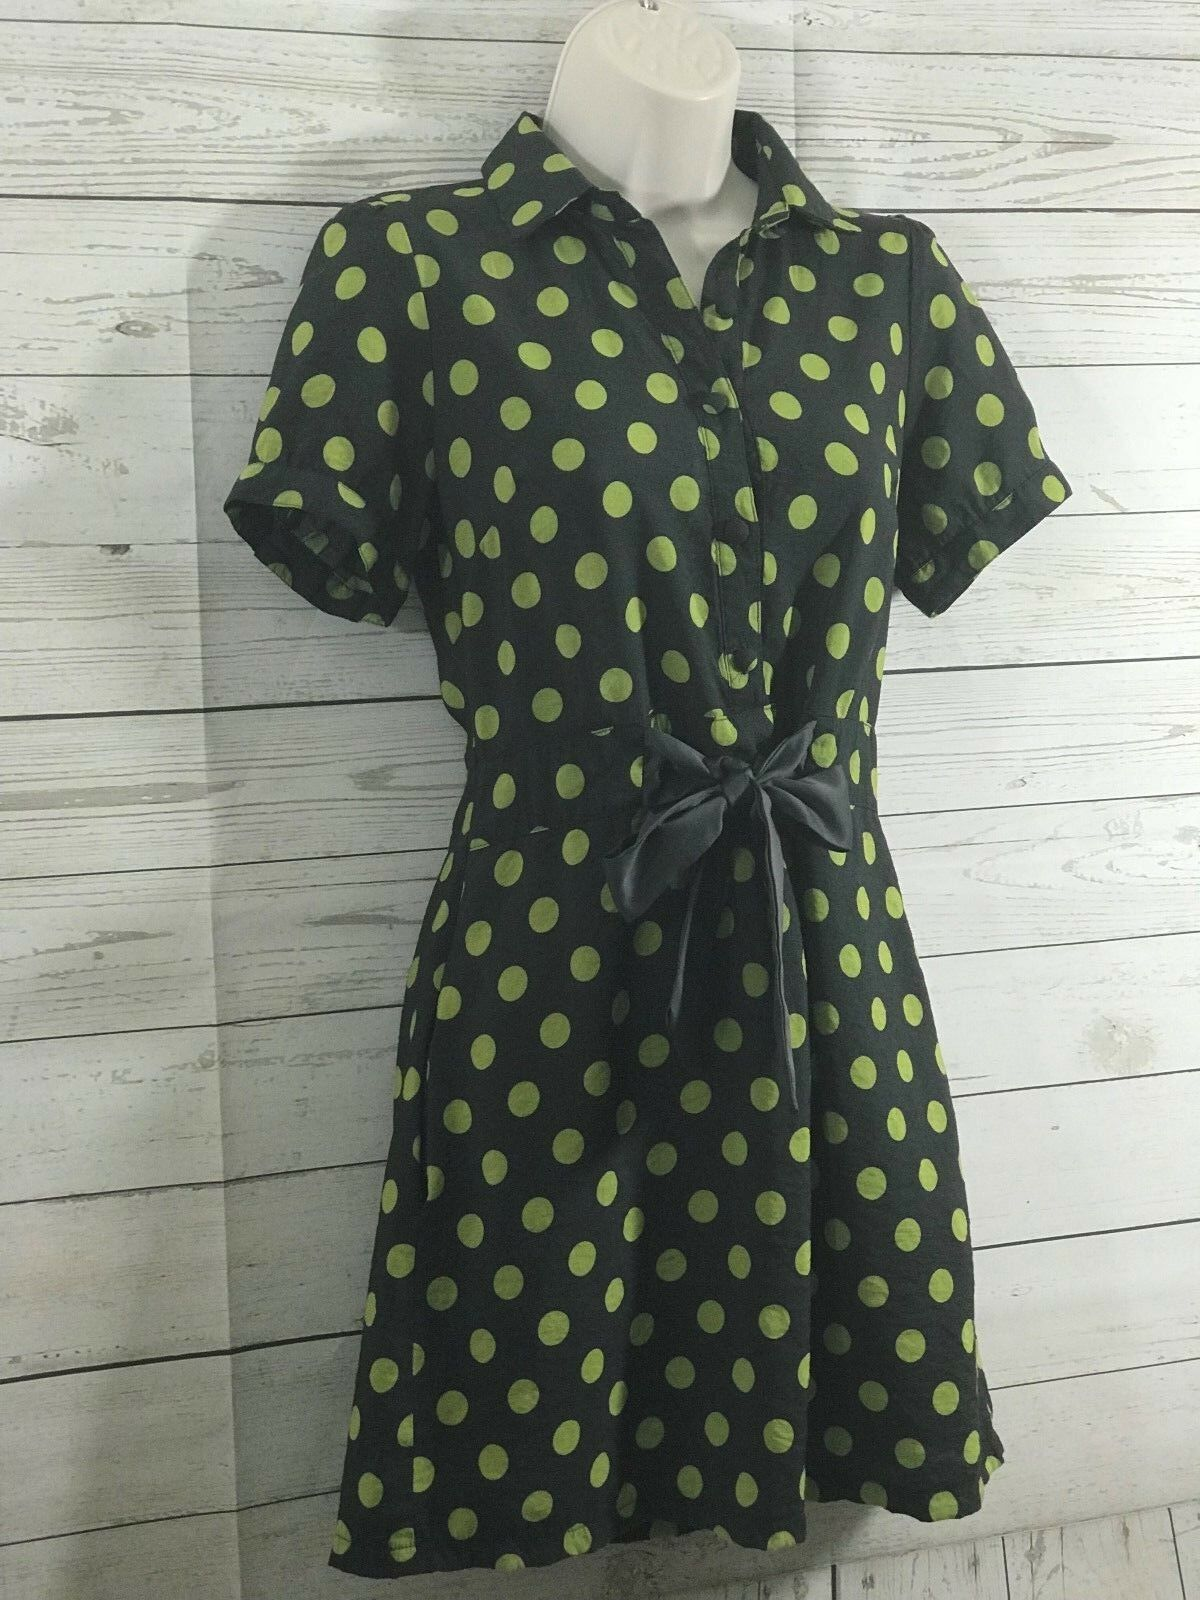 Forever 21 Womens Green Polka Dot Short Sleeve Summer Dress Size Small